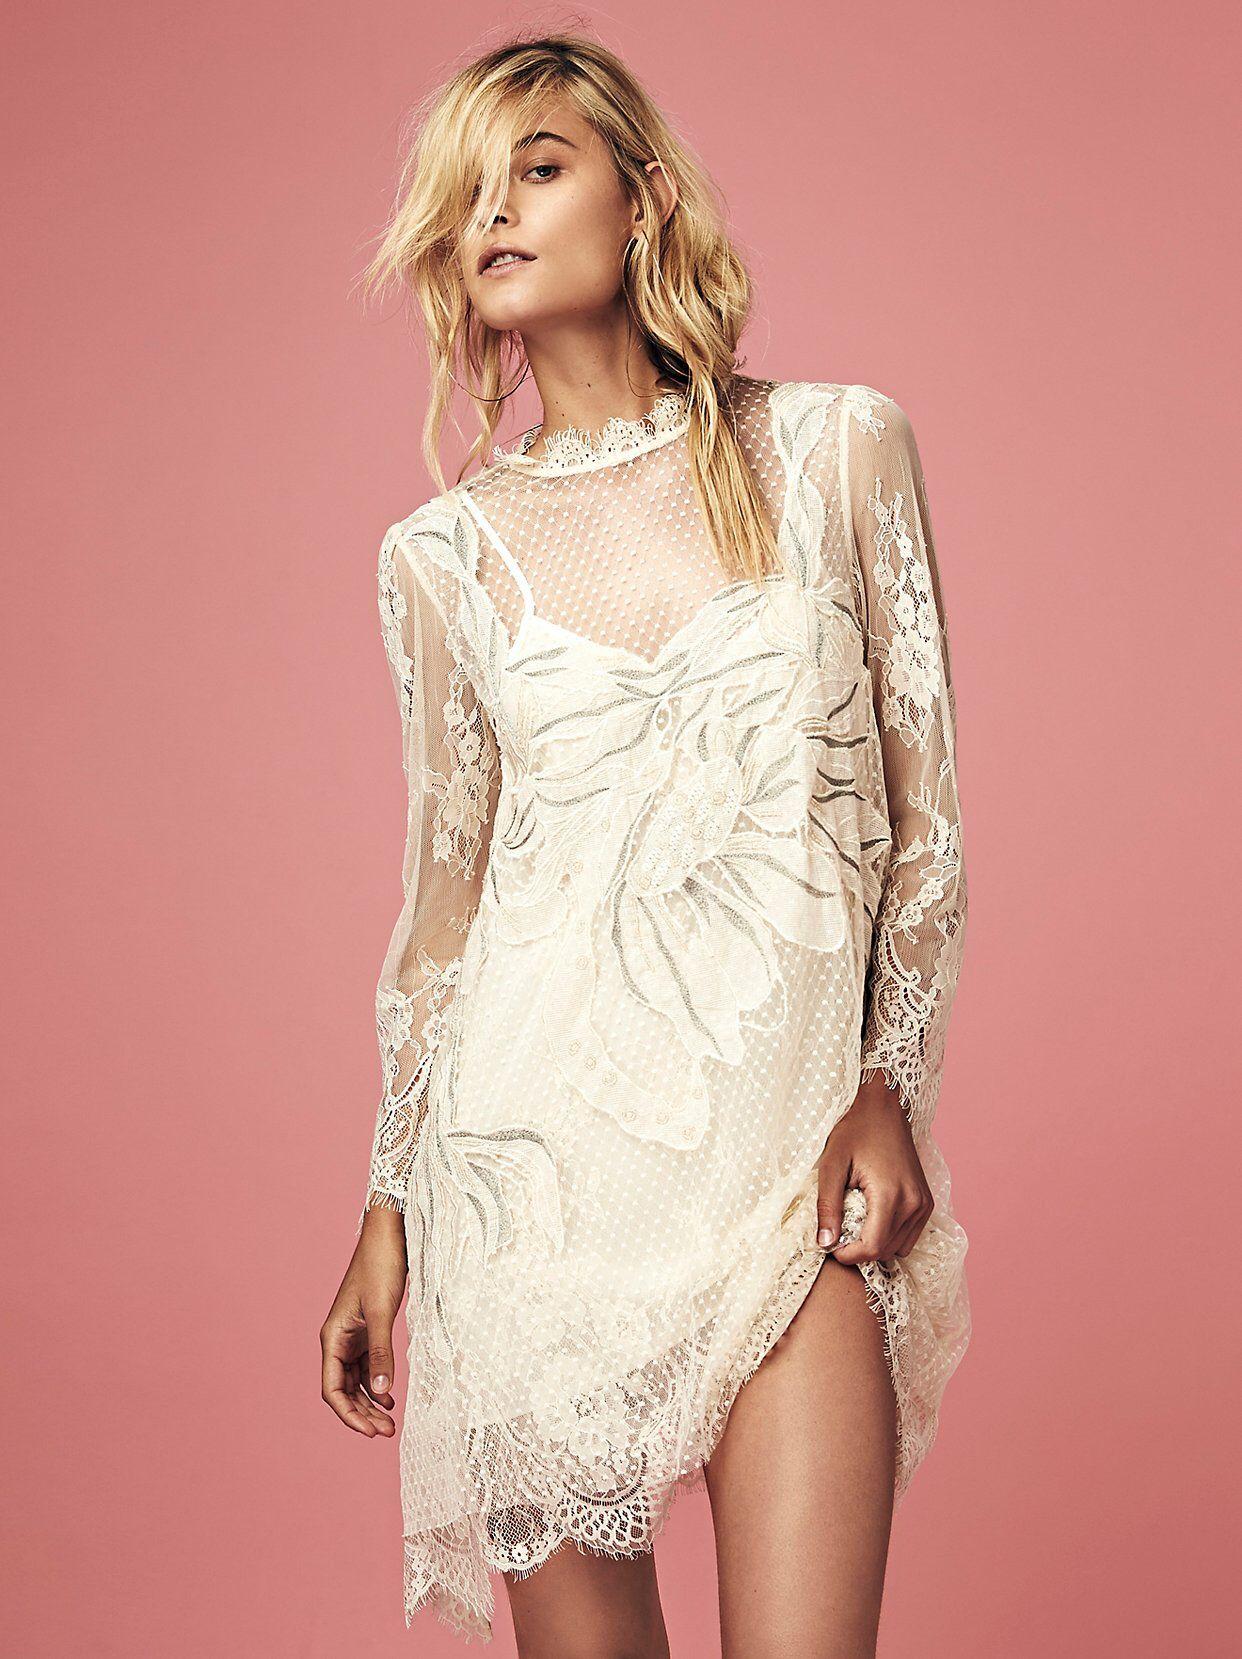 Swan lace mini dress from free people roberto valderrama riveros